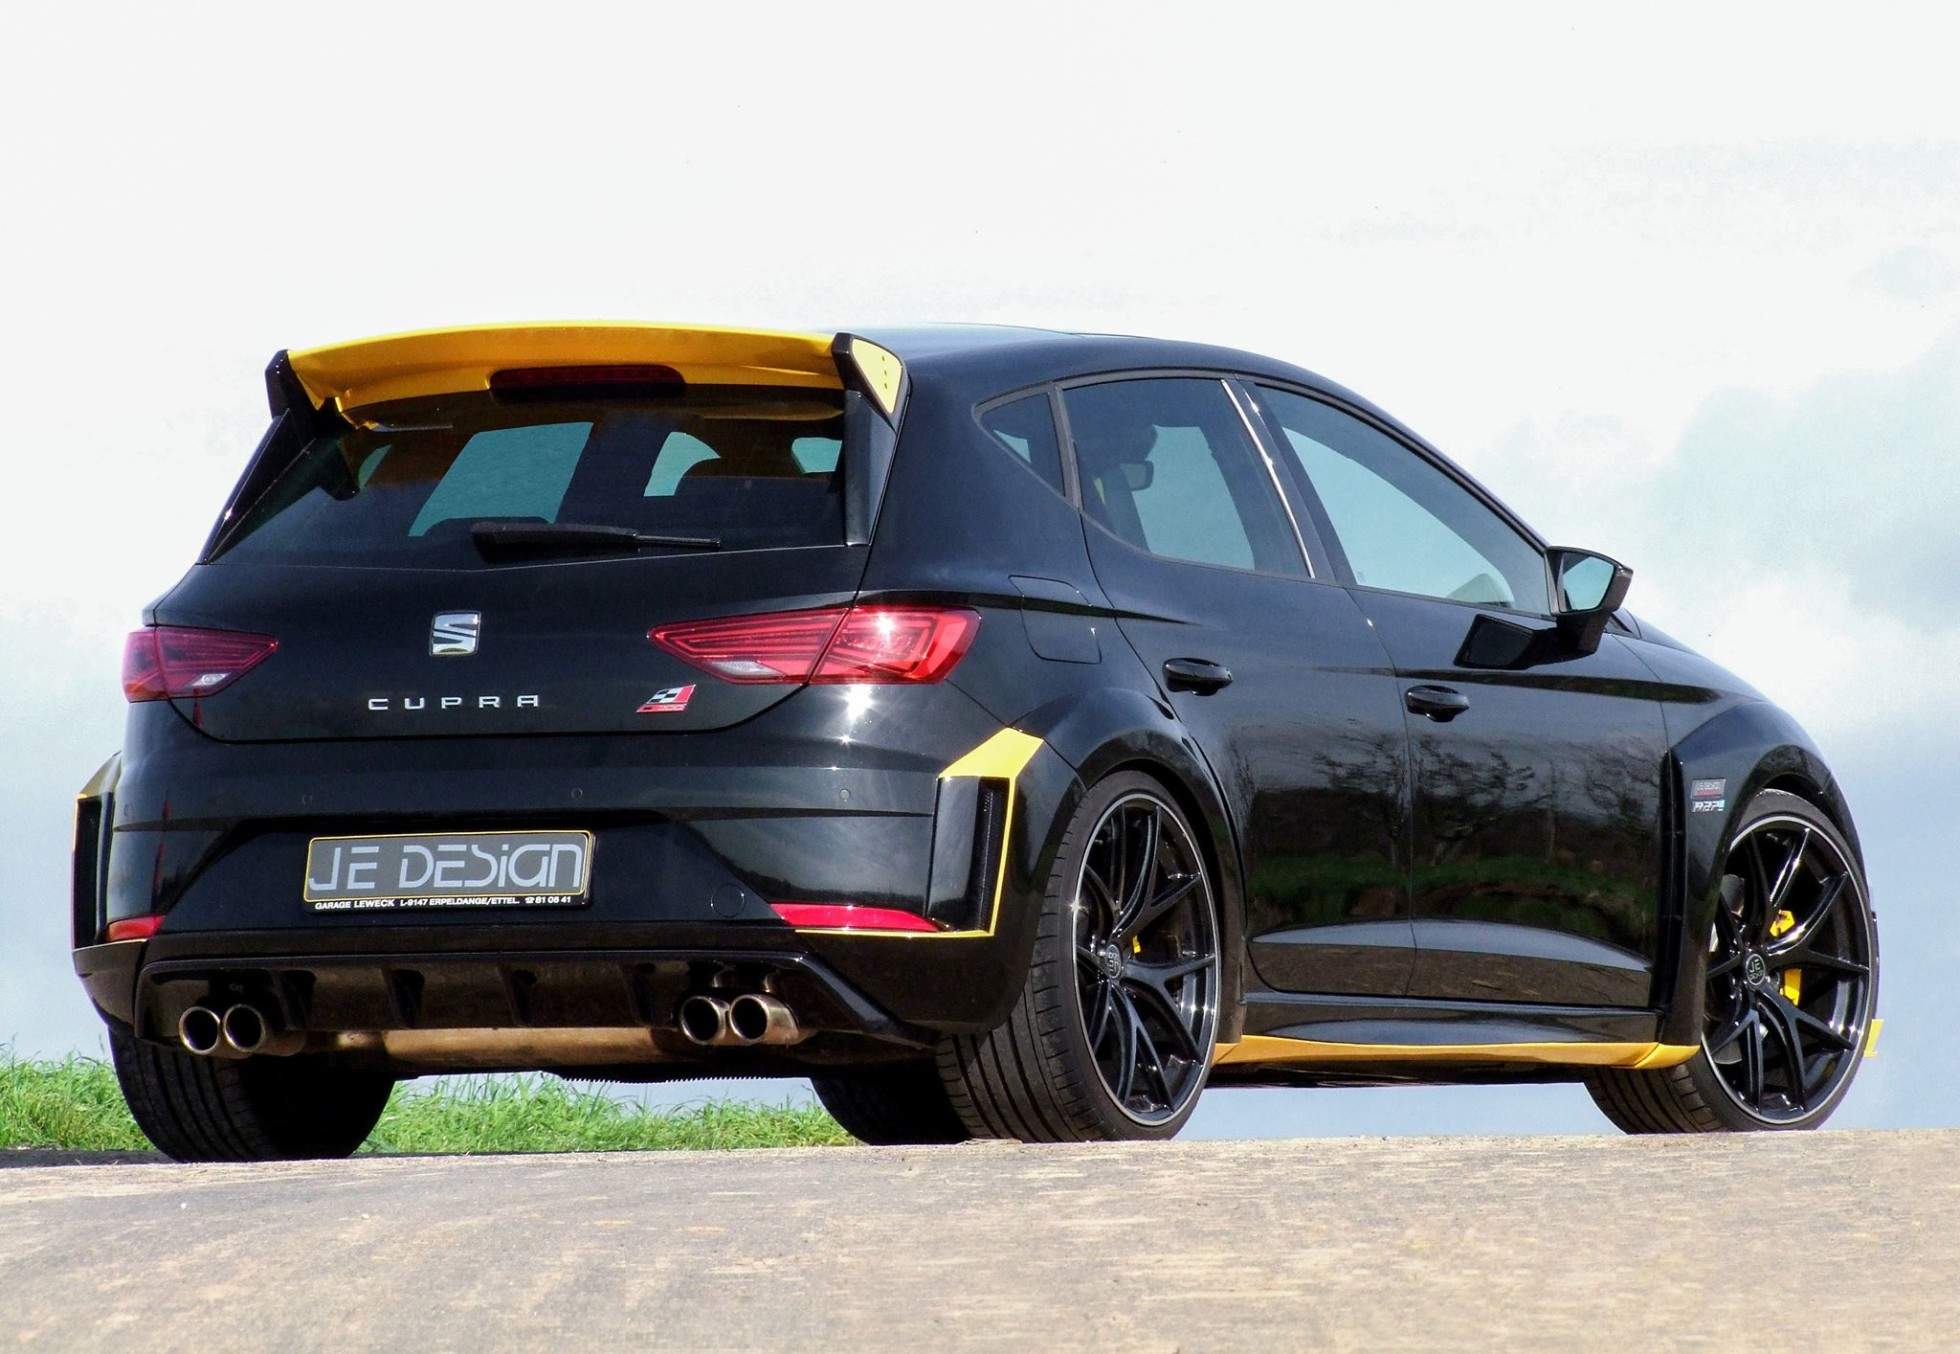 Сеат Leon Cupra JeDesign будет главным конкурентом Ауди RS3 Sportback